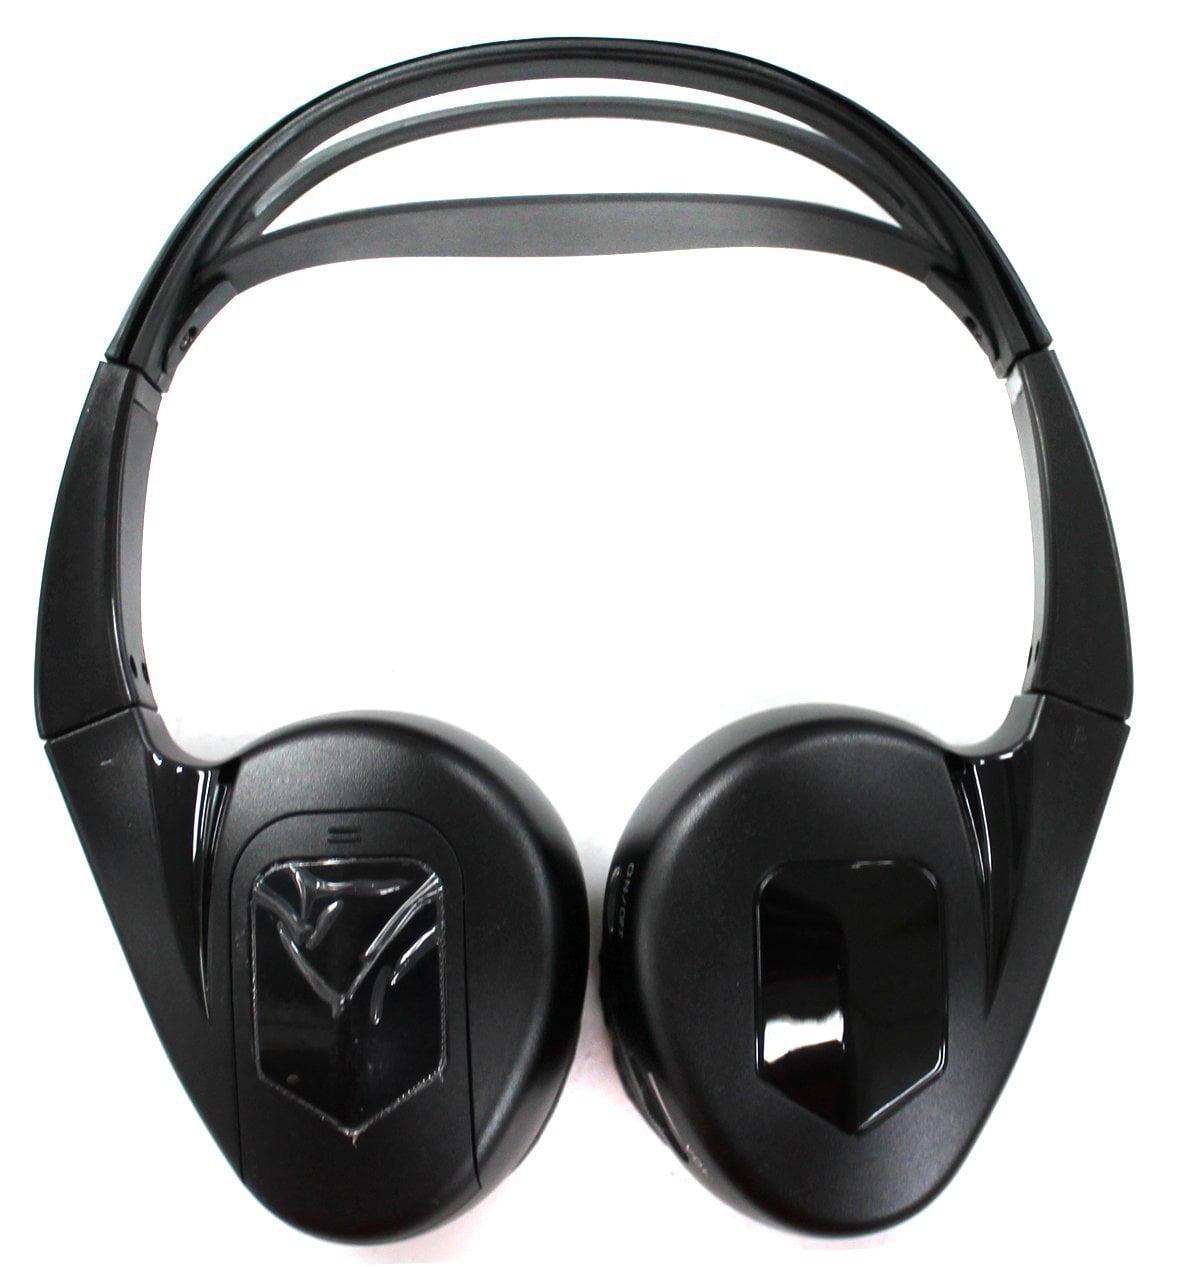 Audiovox IR1 Fold Flat Wireless Automotive Infrared IR 1 CH Stereo Headphones